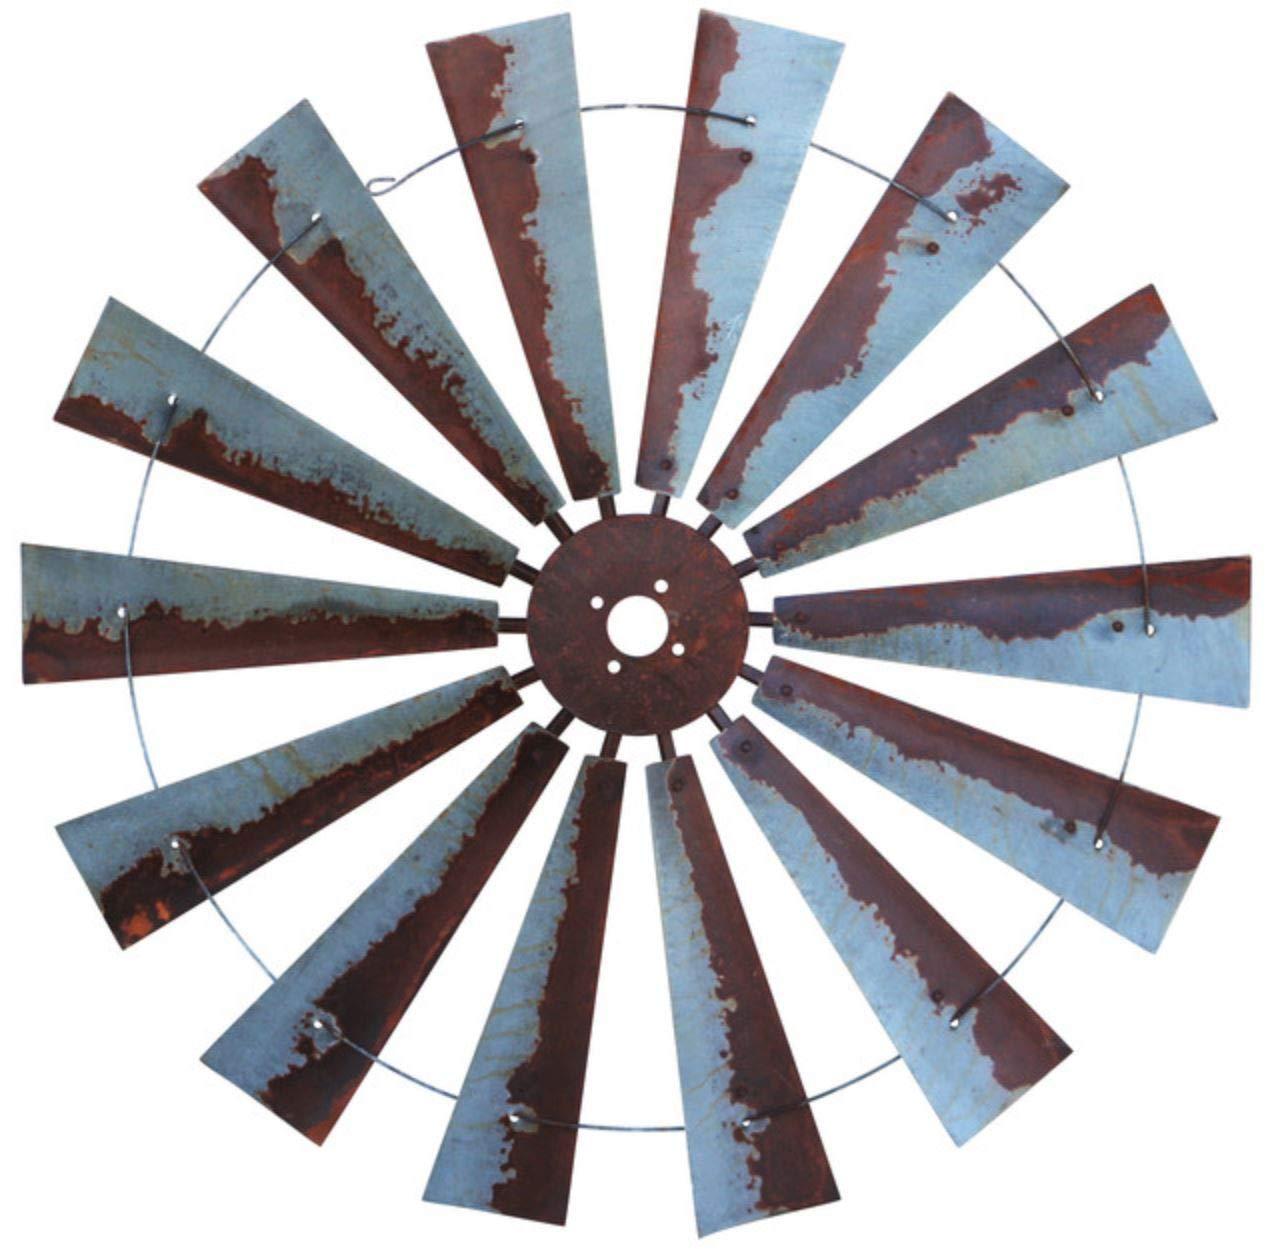 47 Inch Rusty Windmill Wall Art by South West Windmill